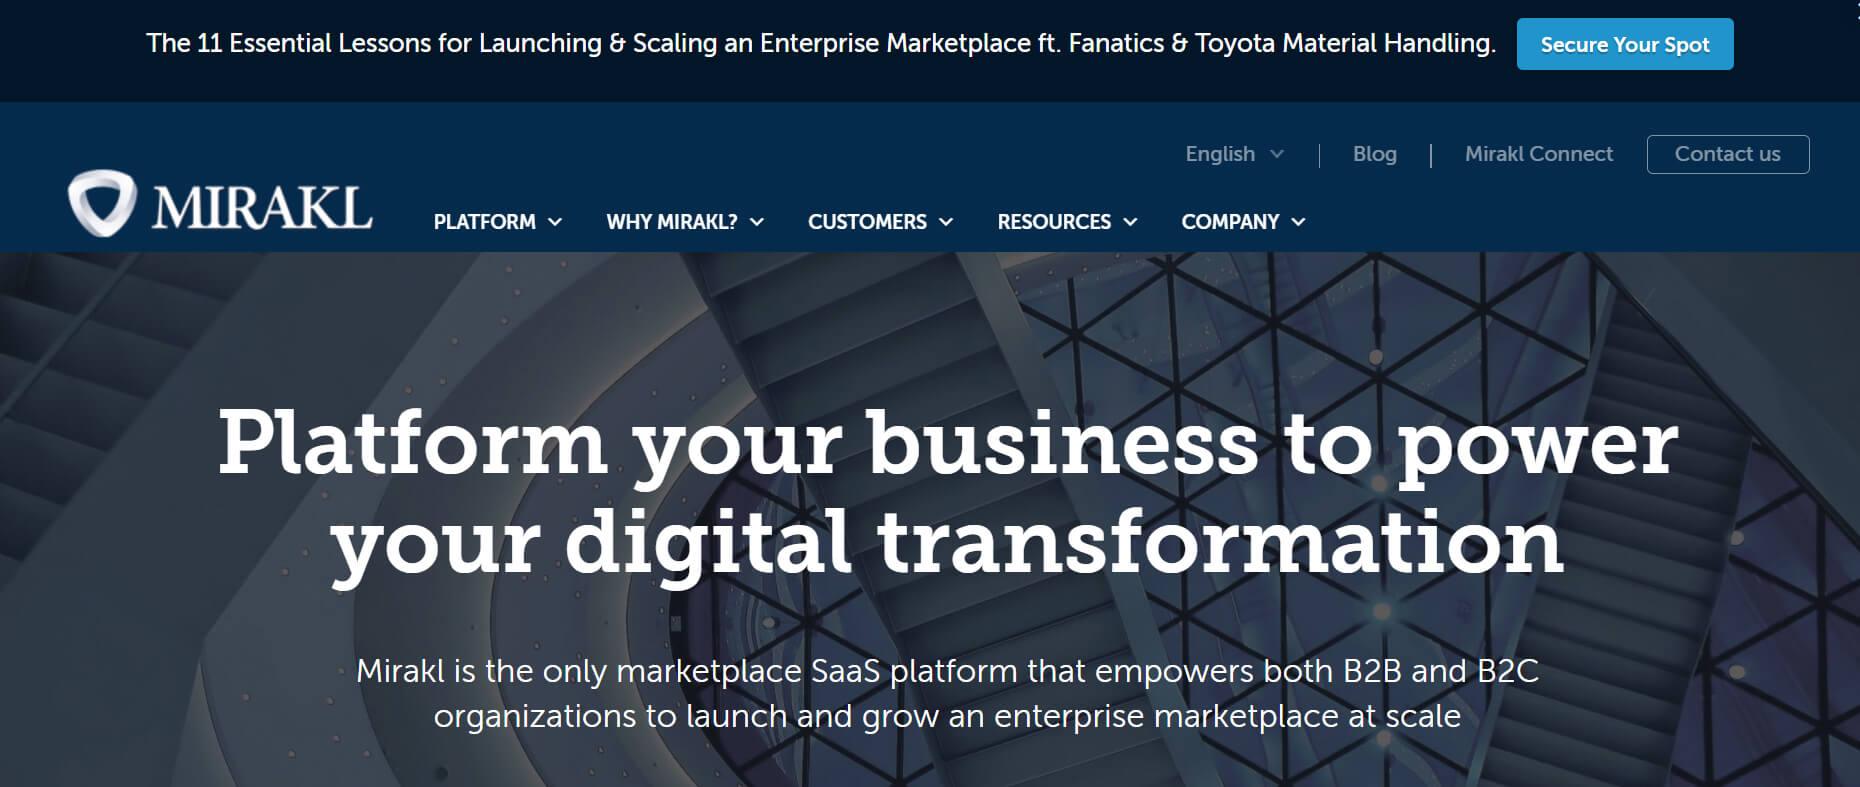 mirakl marketplace platform